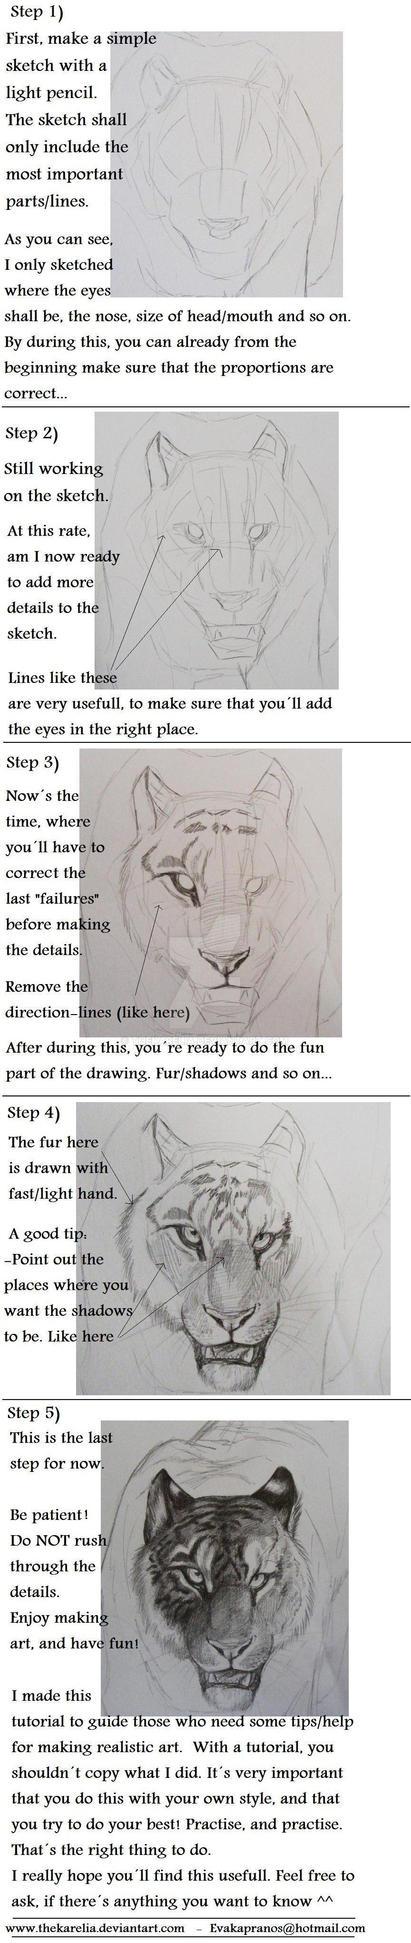 Realistic Tiger Tutorial by TheKarelia